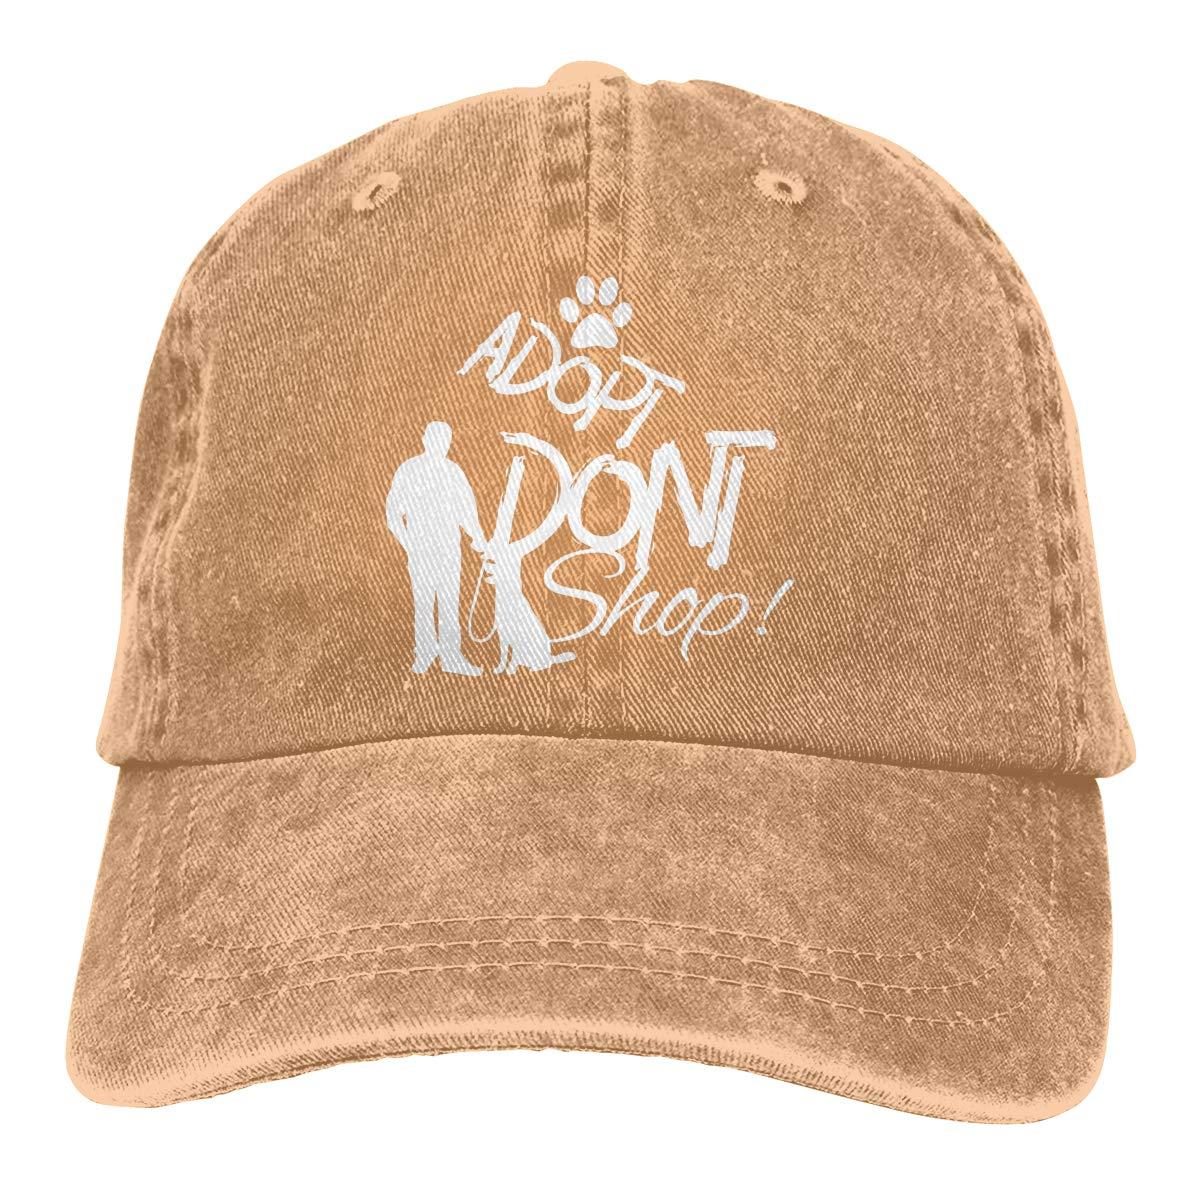 Men Women Distressed Denim Fabric Baseball Cap Dog Rescue Adopt Dont Shop Headwear